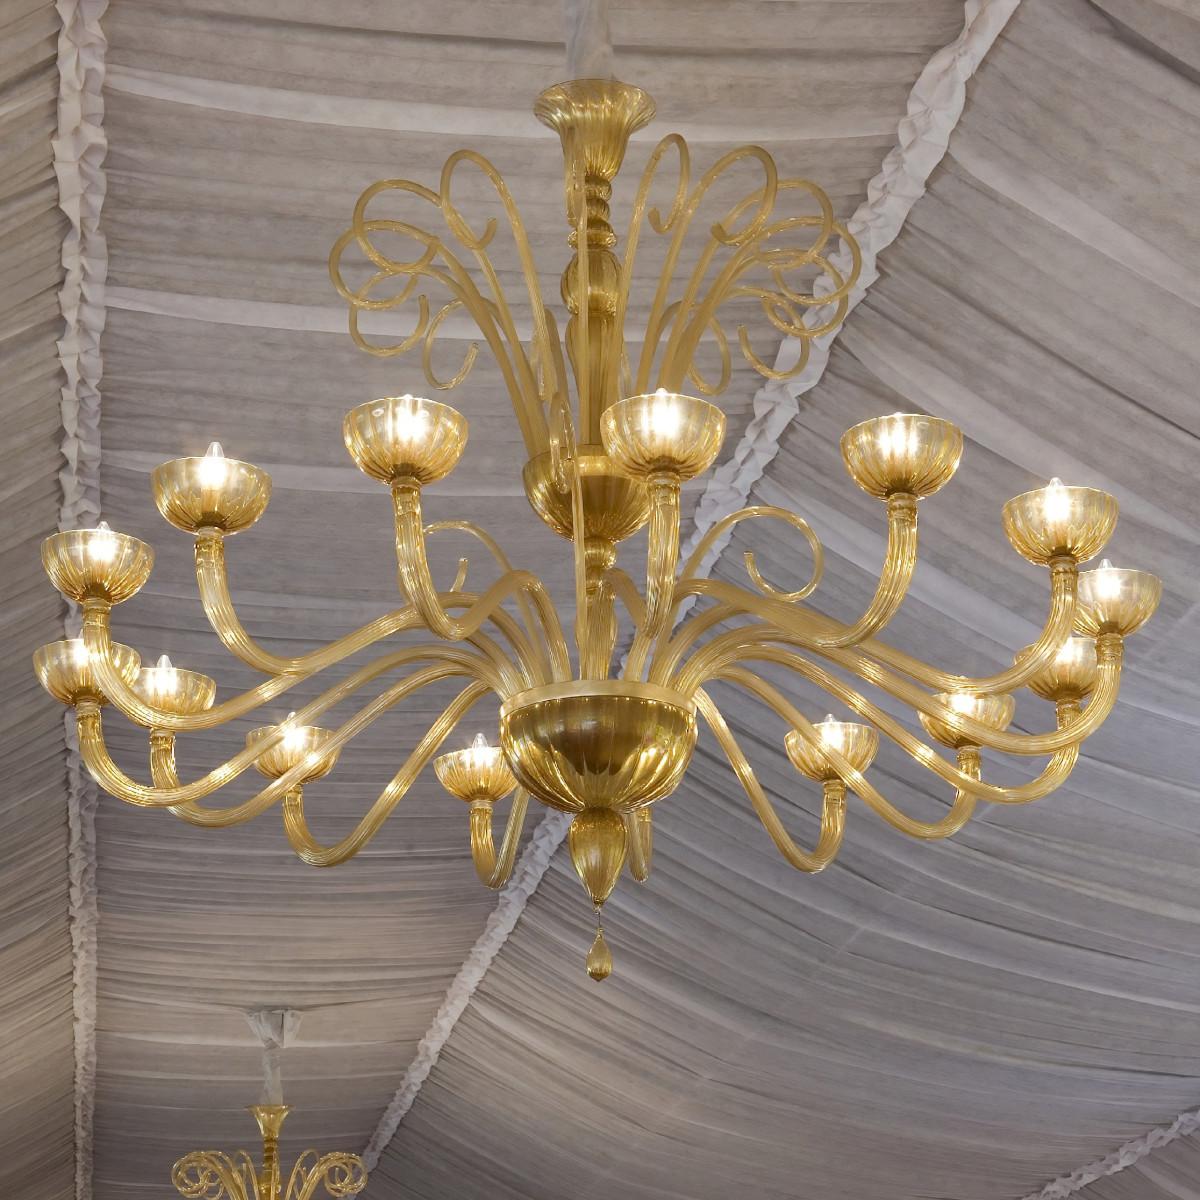 """Sinfonia"" lustre en verre de Murano 15 lumieres - ambre et or"